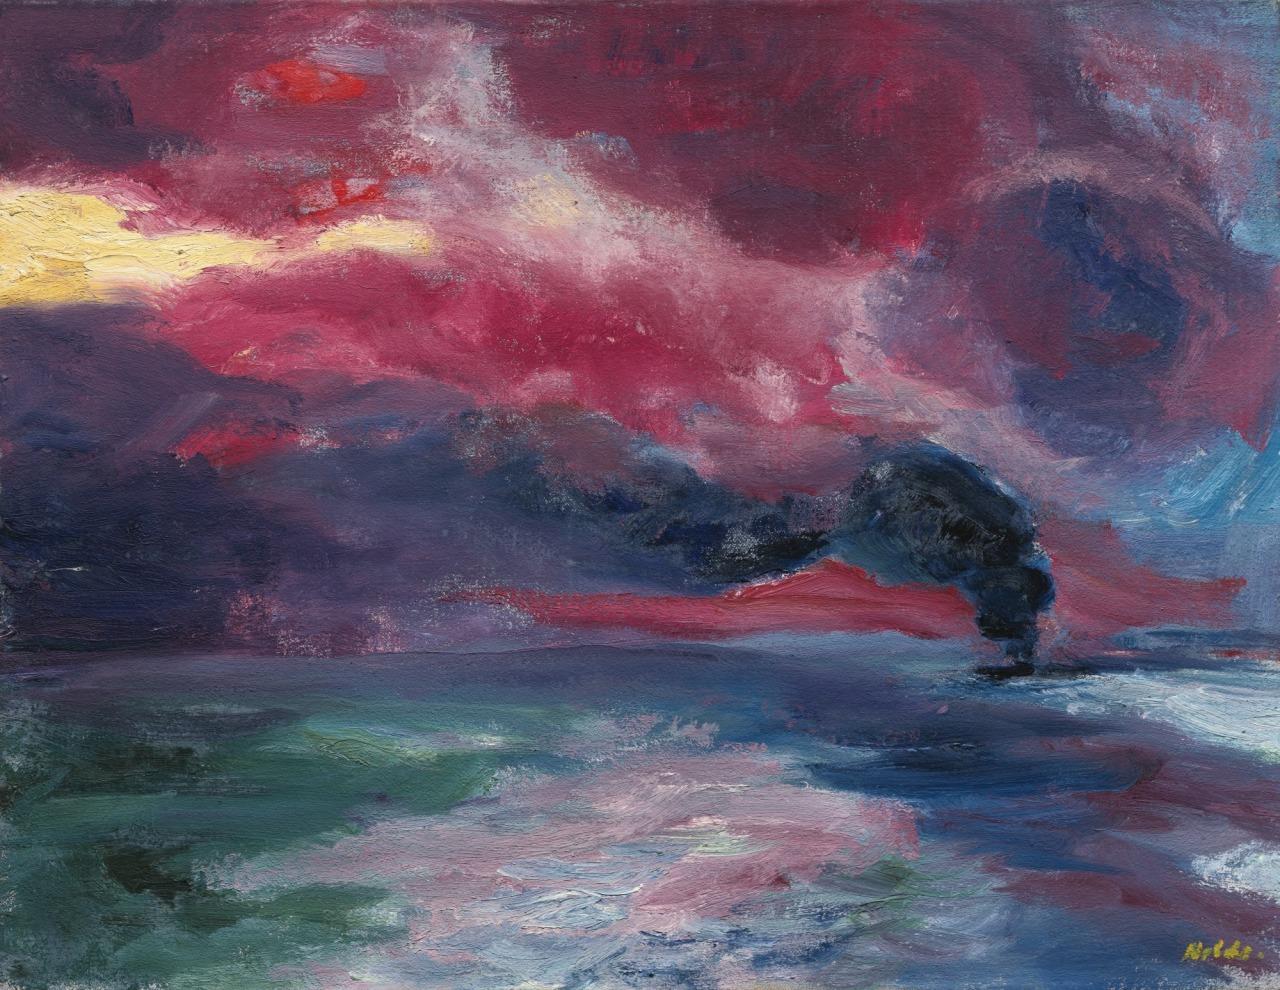 lawrenceleemagnuson: Emil Nolde (1867-1956)Abendliches Herbstmeer - Autumn Evening Sea (1951)oil on canvas68.5 x 88.5 cm